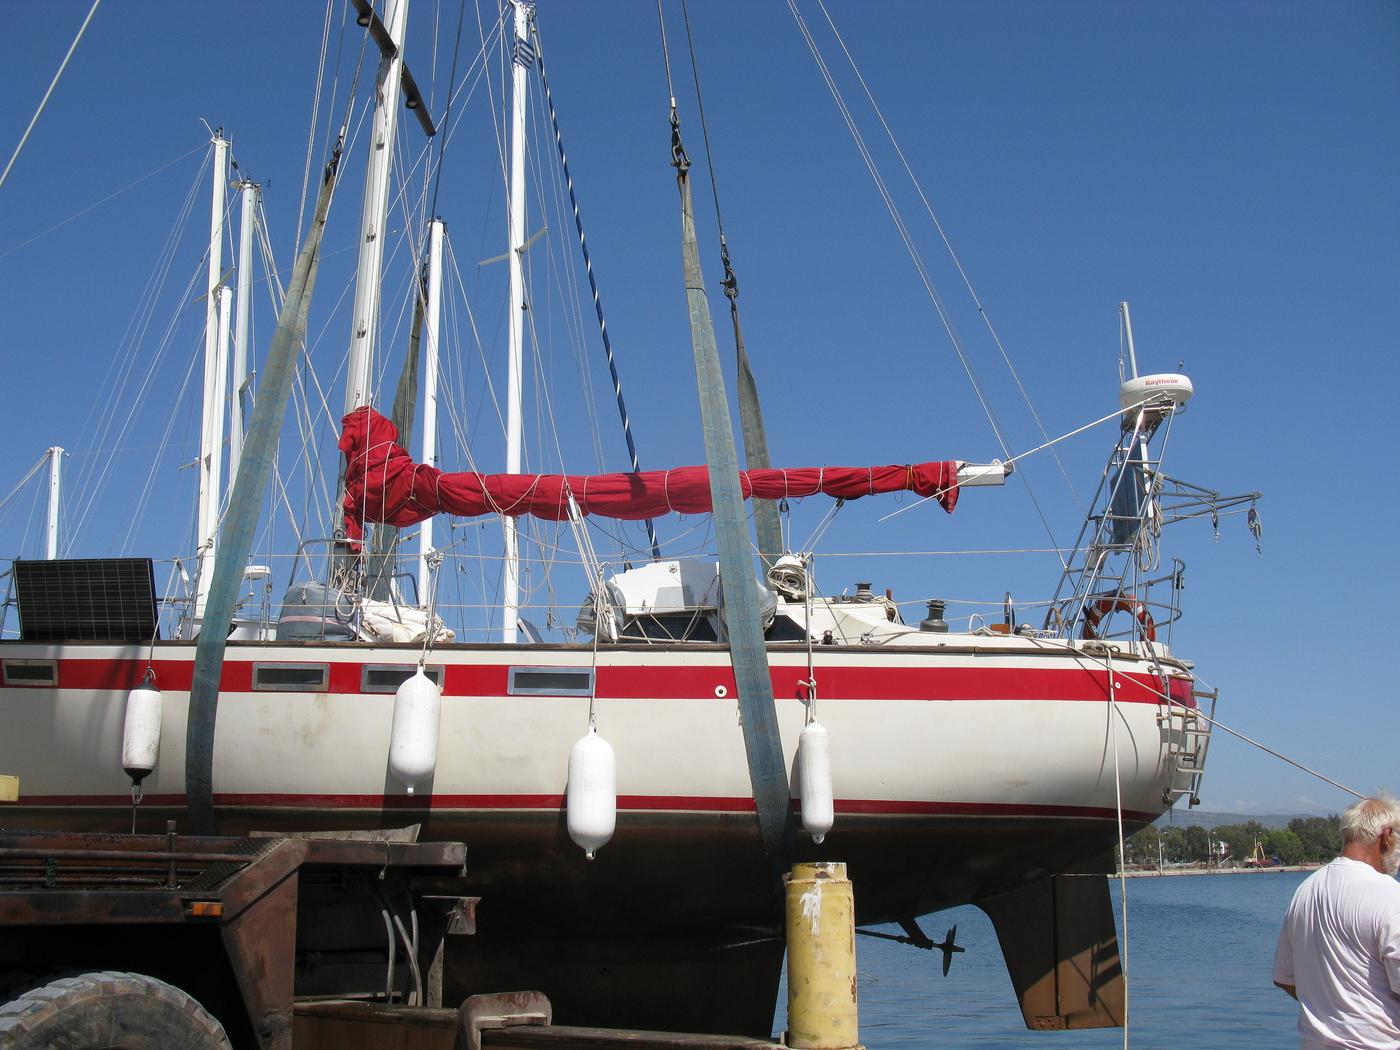 123 - Bockra - liftout